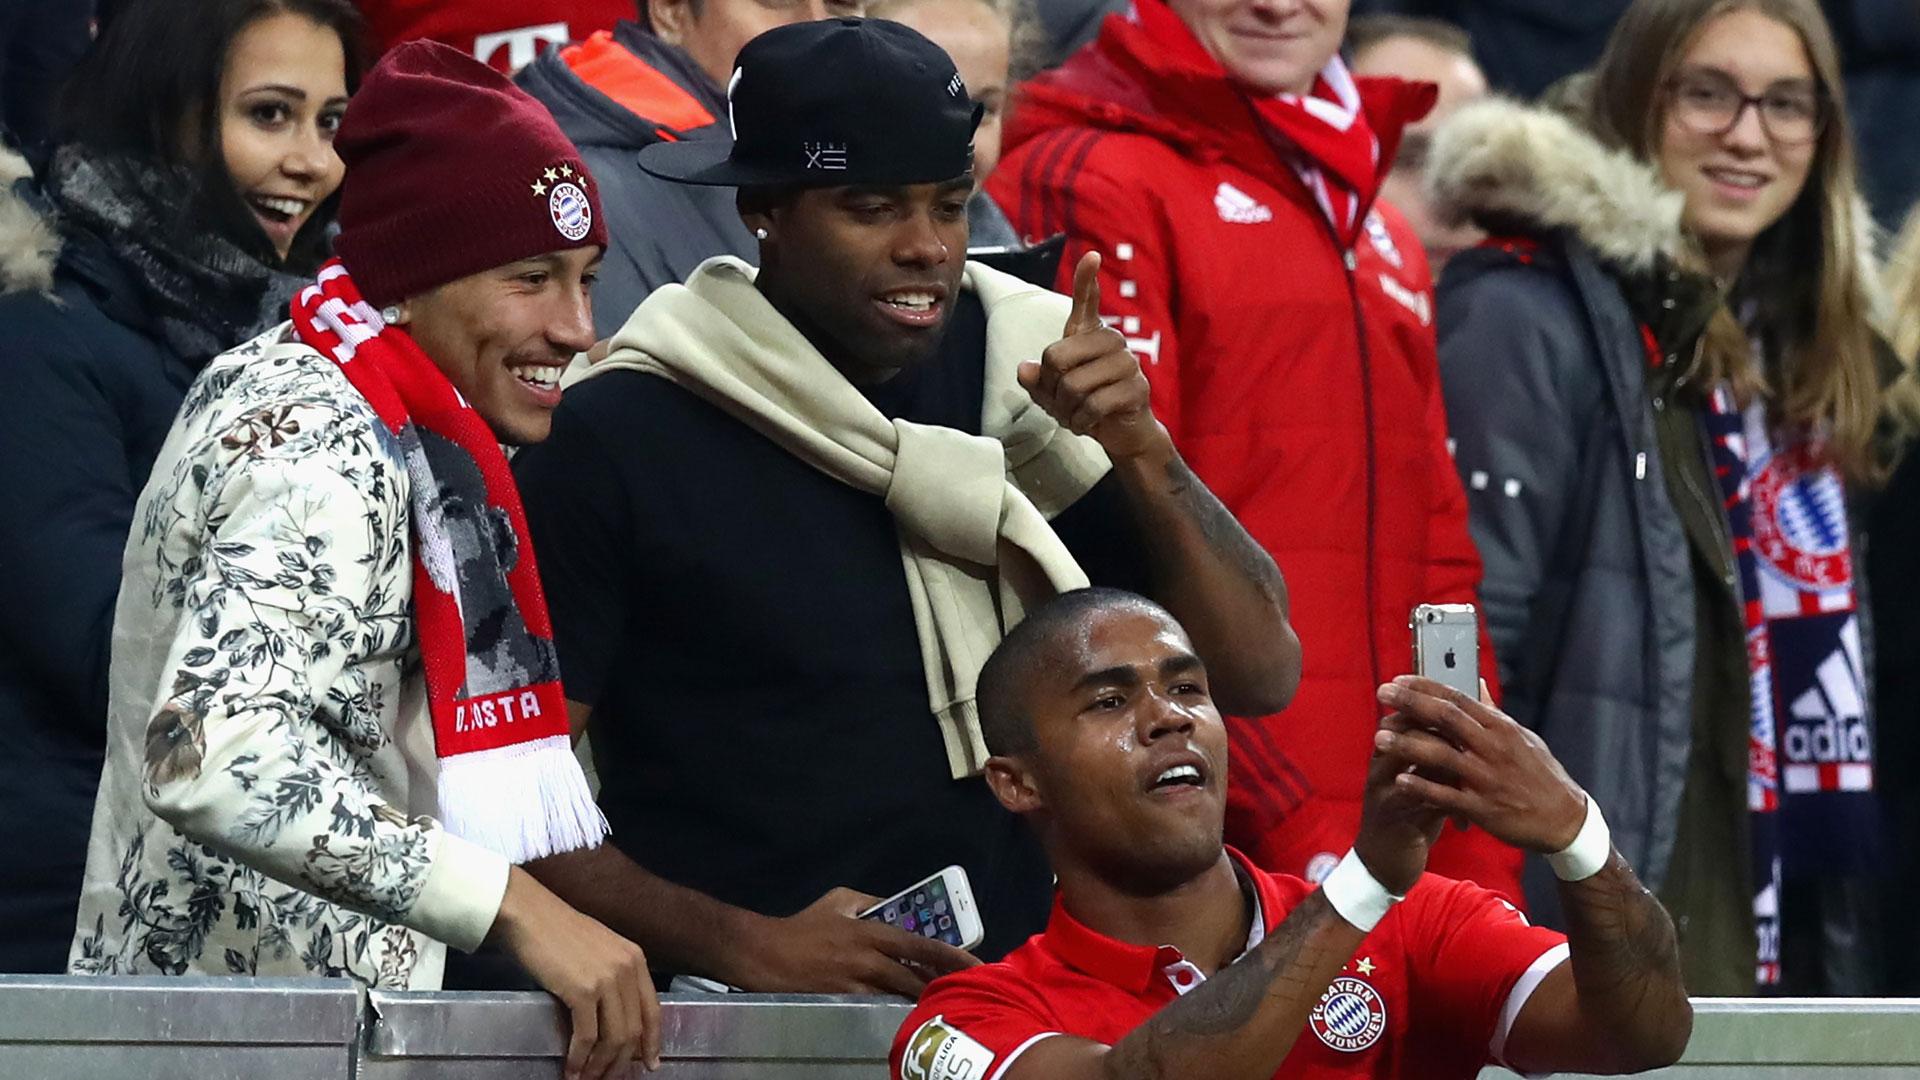 Neuer, Müller e Rummenigge comentam selfie de Douglas Costa